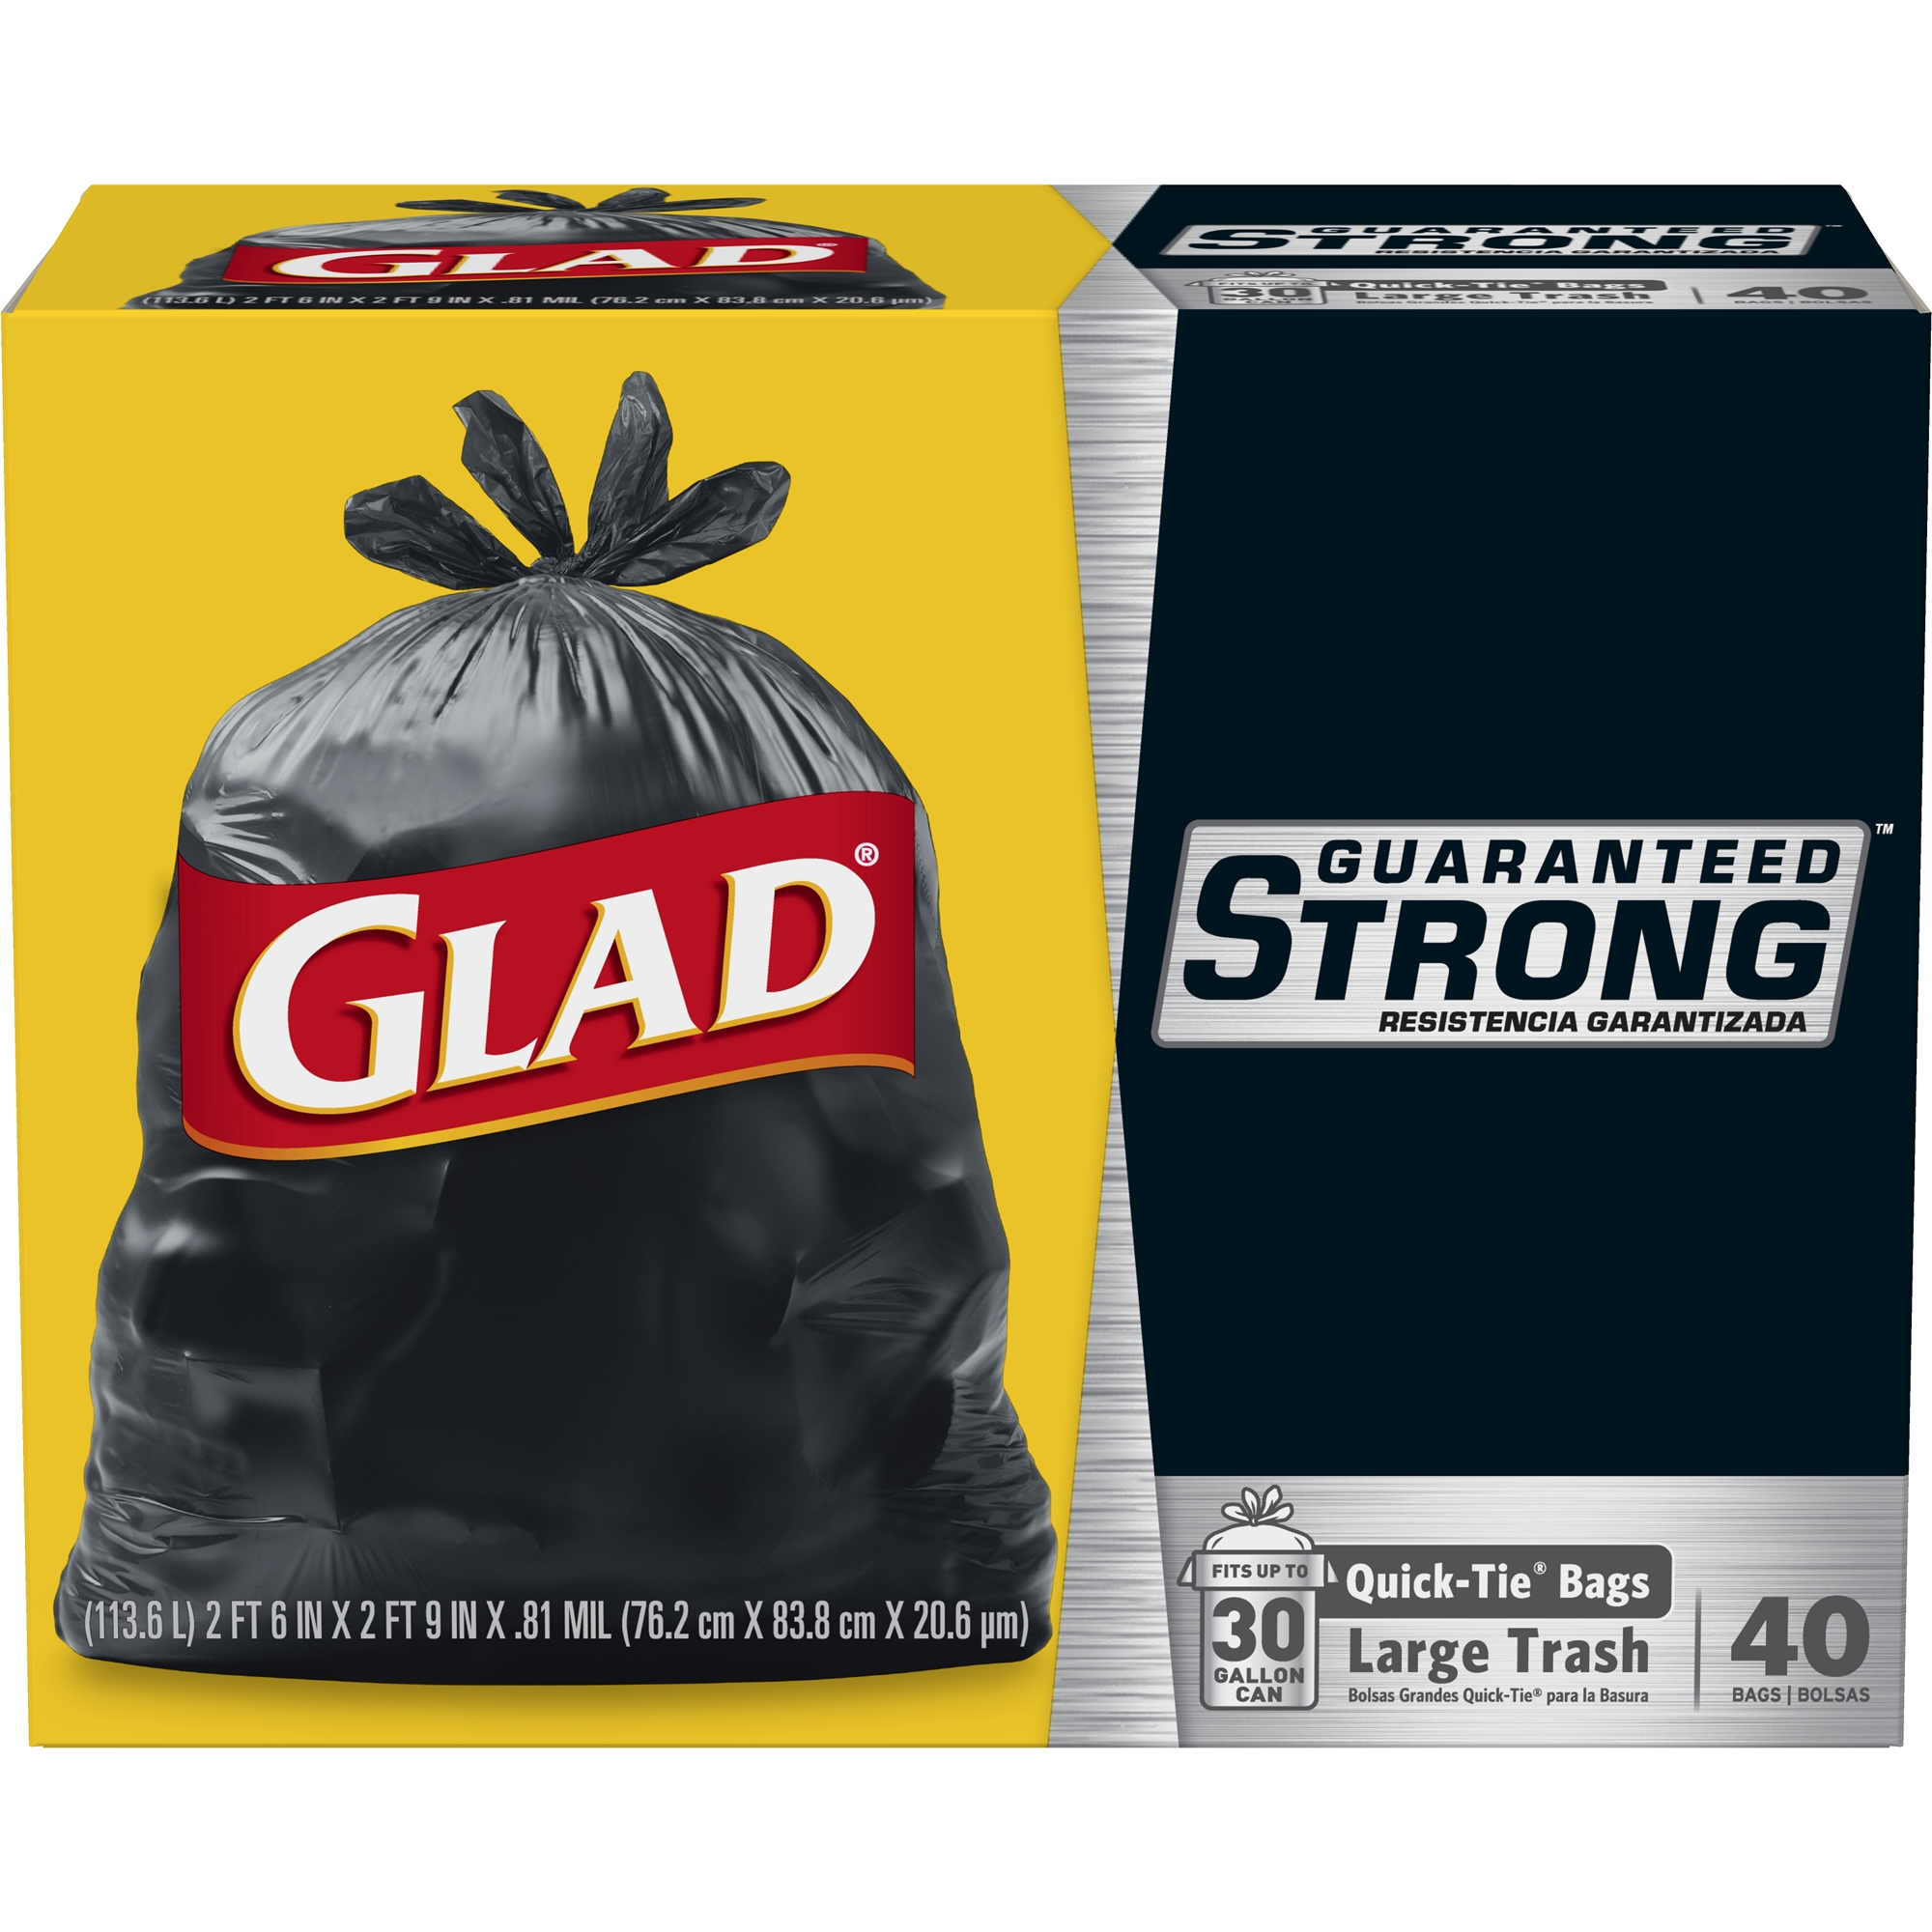 30 Gal Extra Large Black Trash Bags Garbage Yard Lawn Waste Heavy Duty 50 Count